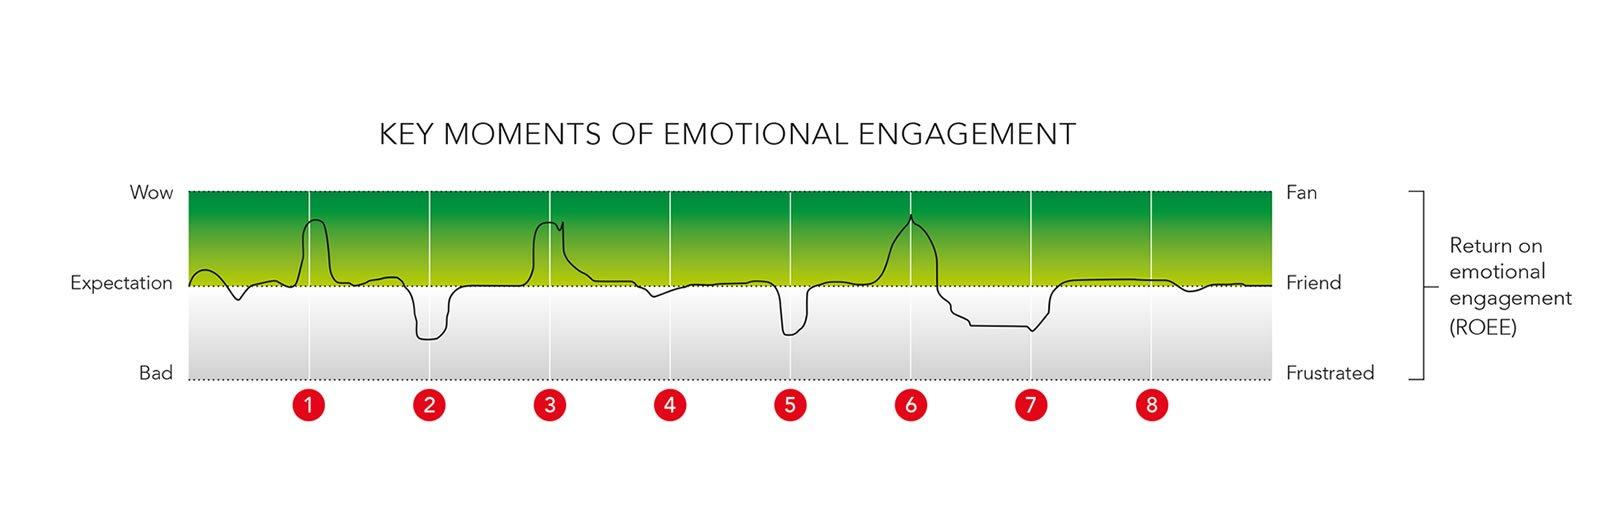 key moments of emotional engagement